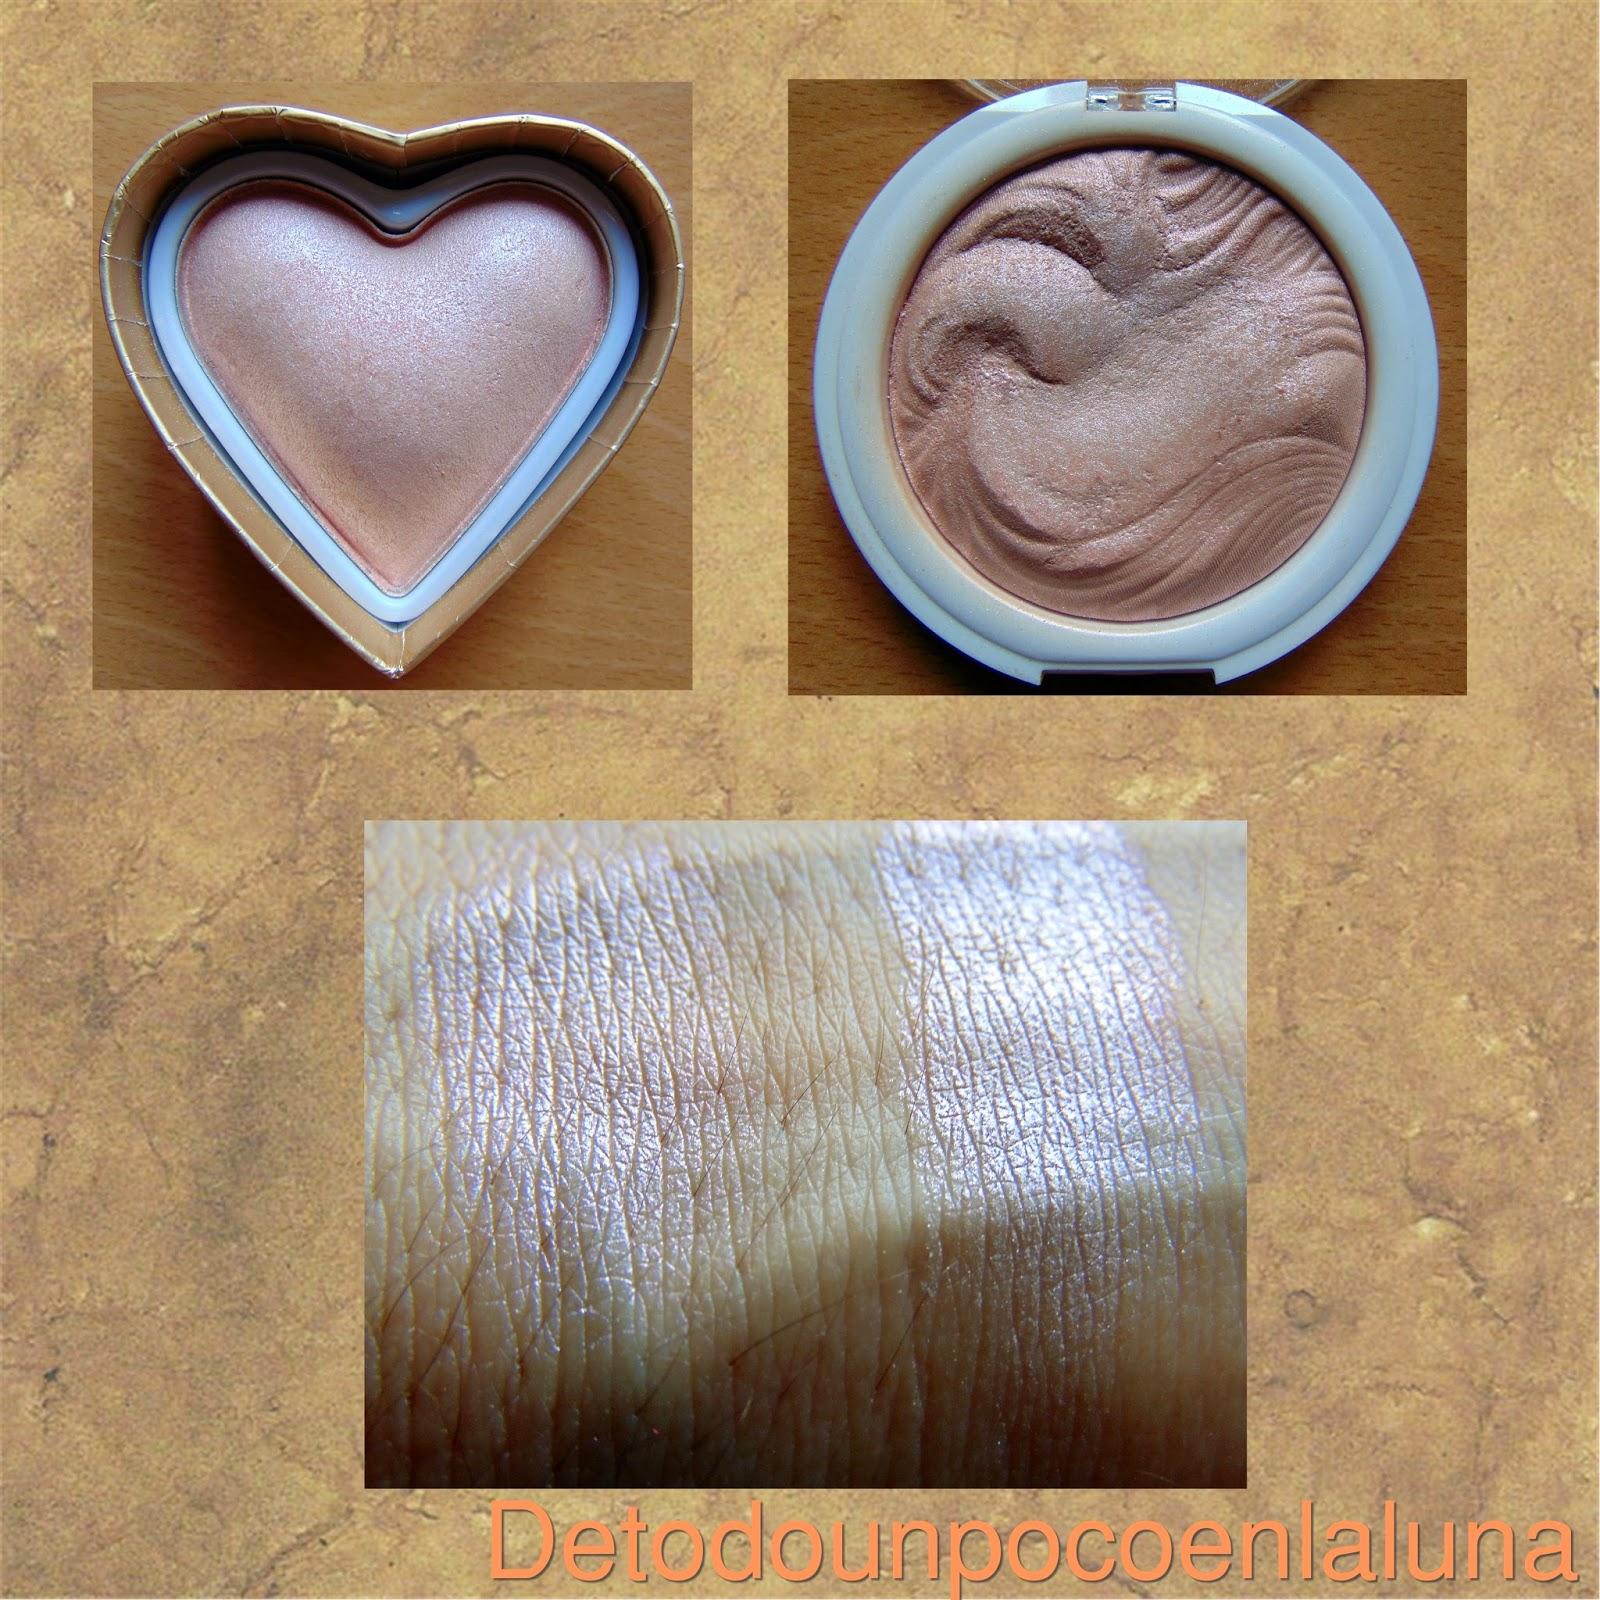 comparación goddess of love y undress your skin mua i heart makeup